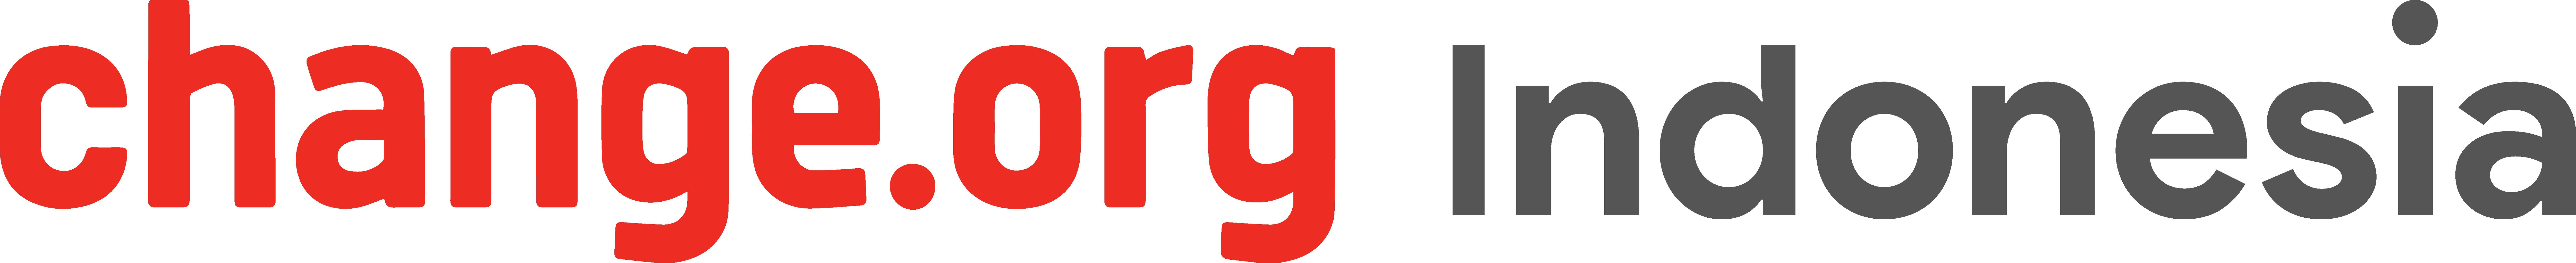 change indonesia logo